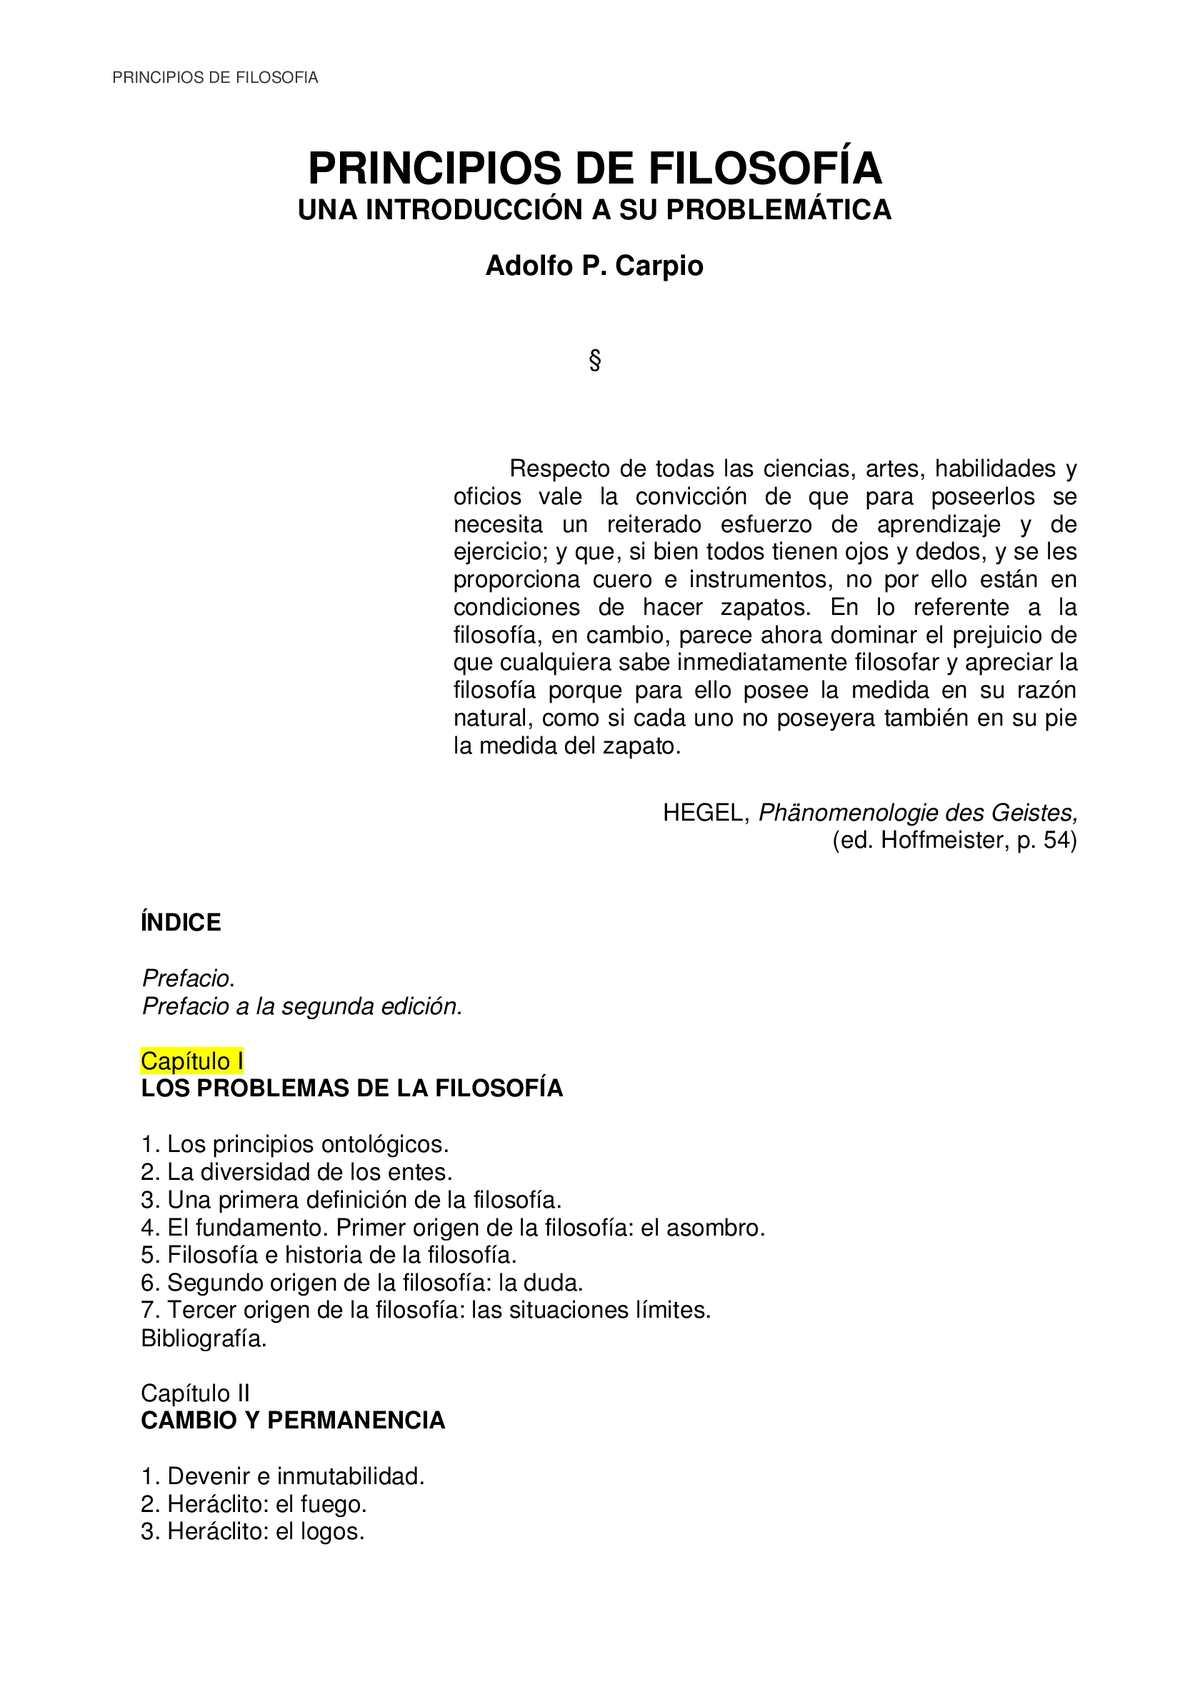 Calaméo - Adolfo Carpio - Principios de Filosofía